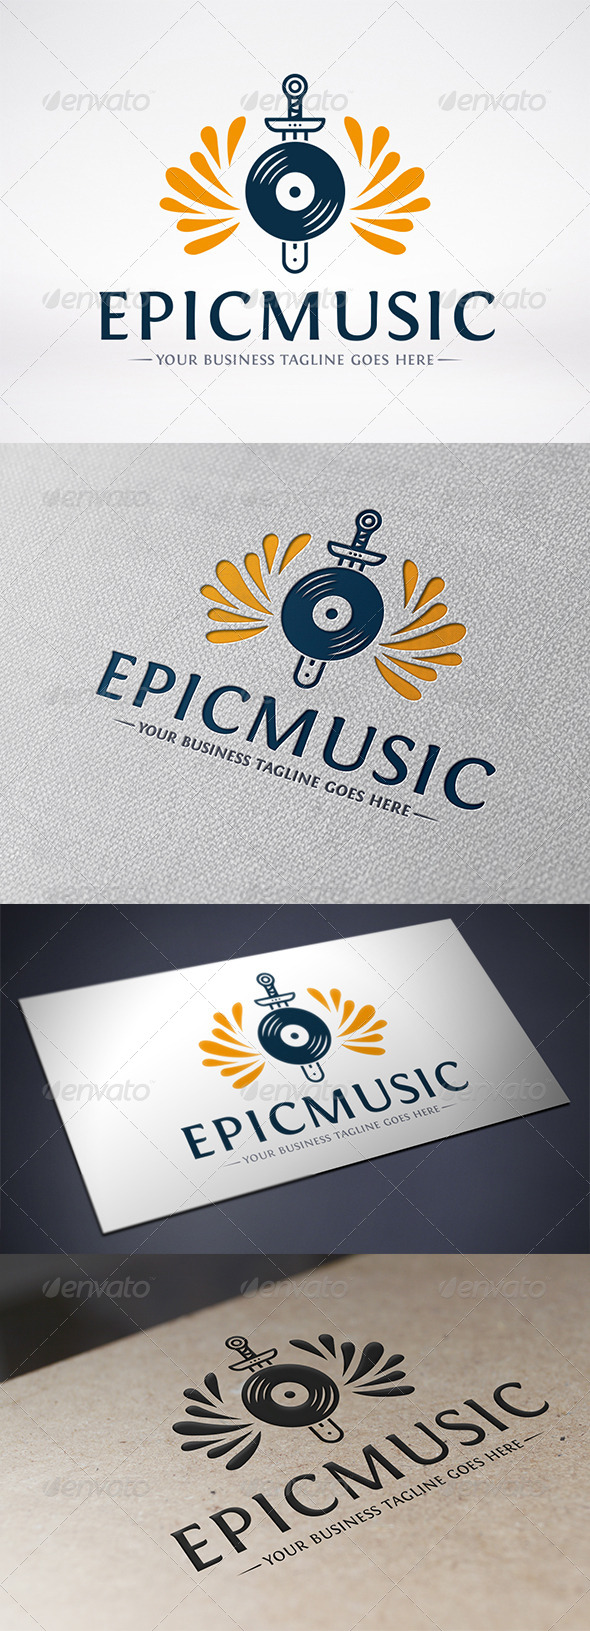 Epic Music Logo Template